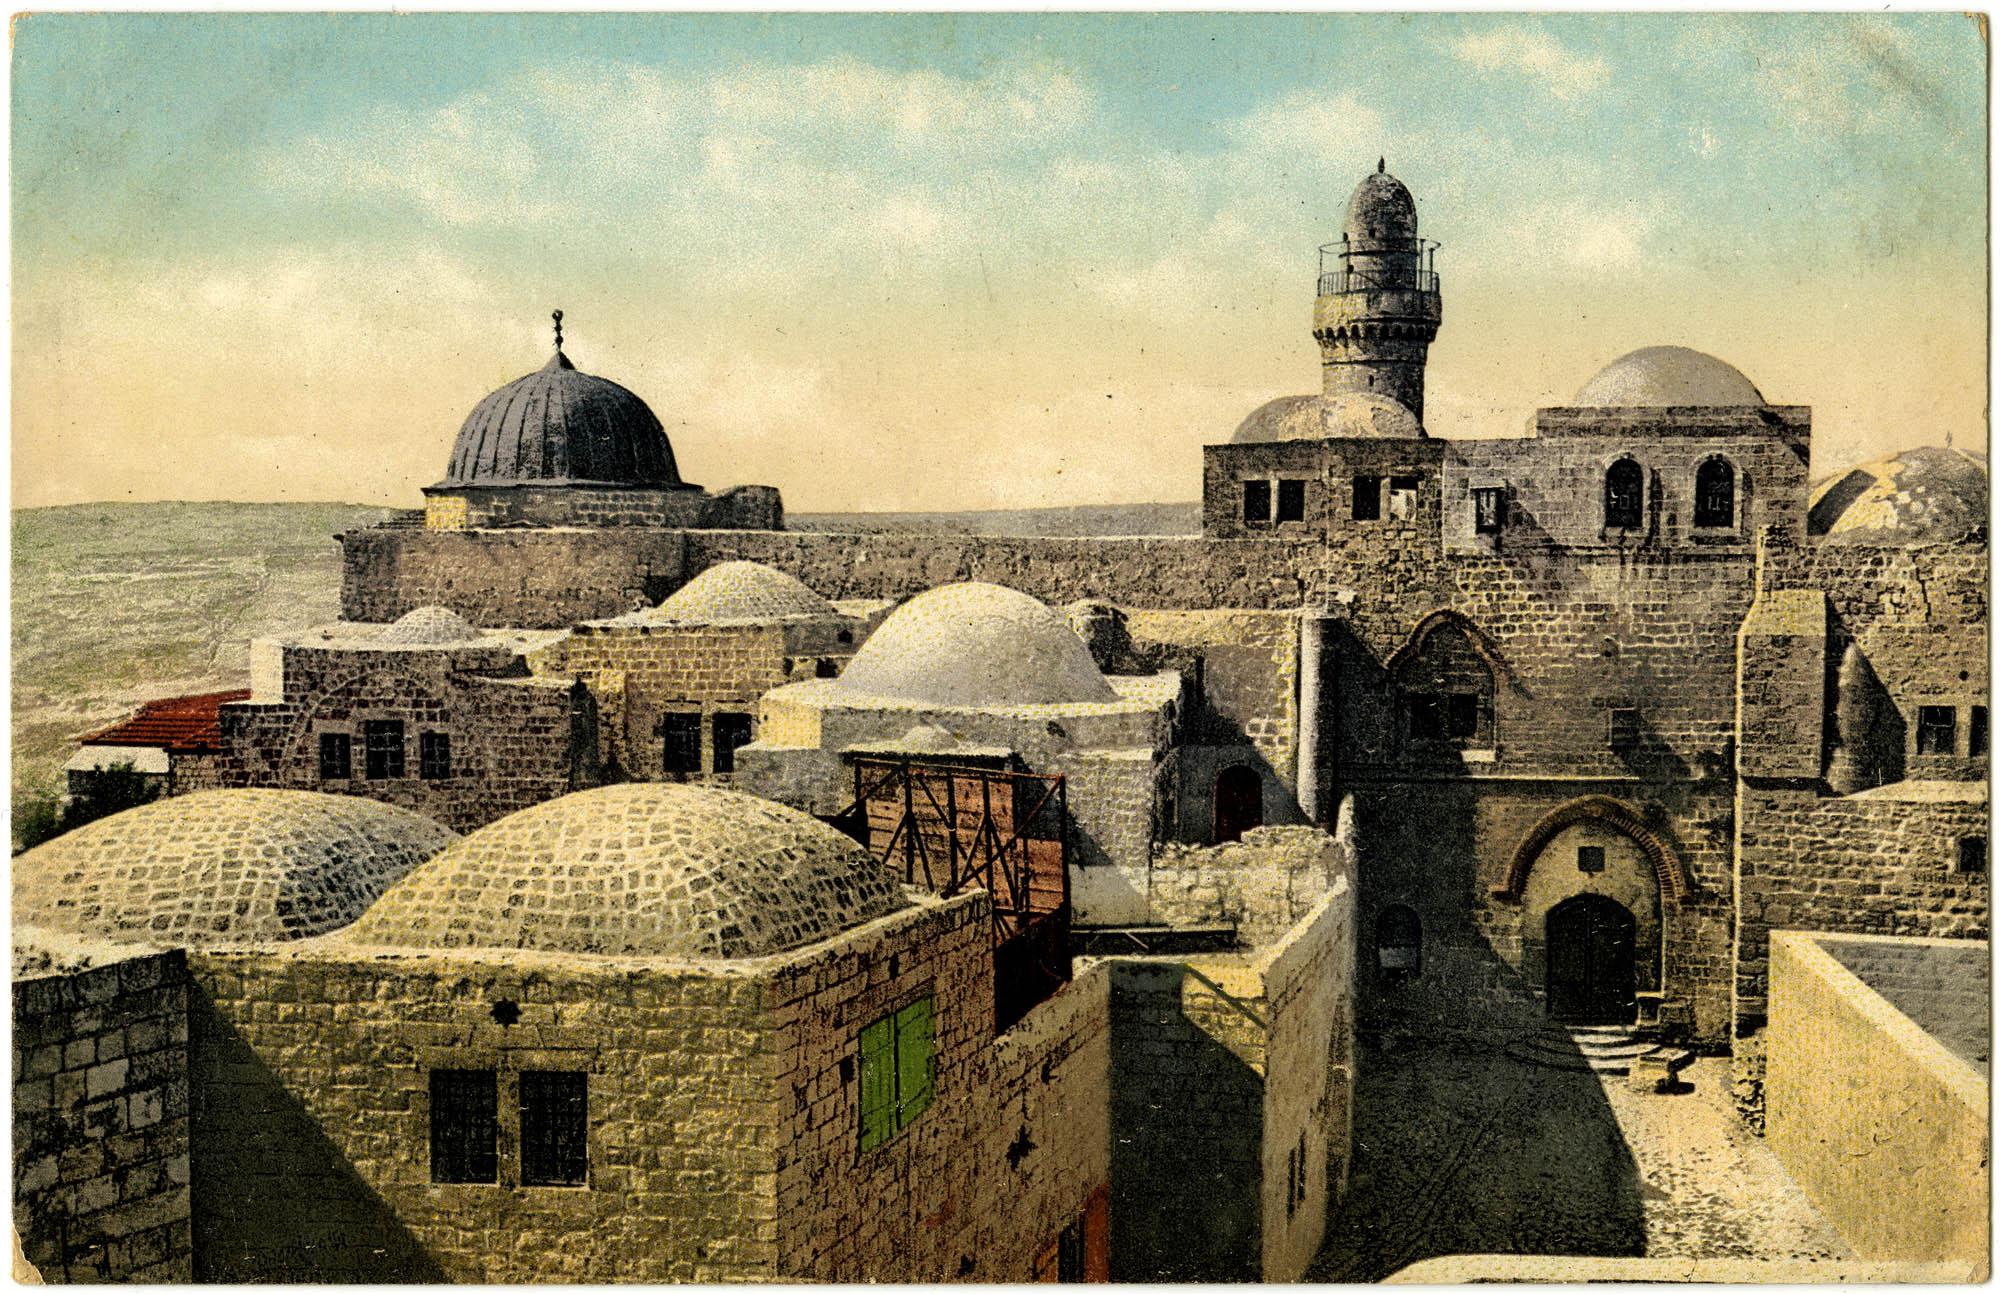 Jerusalem. Tomb of David. / Davids Grab. / Tombeau de David.